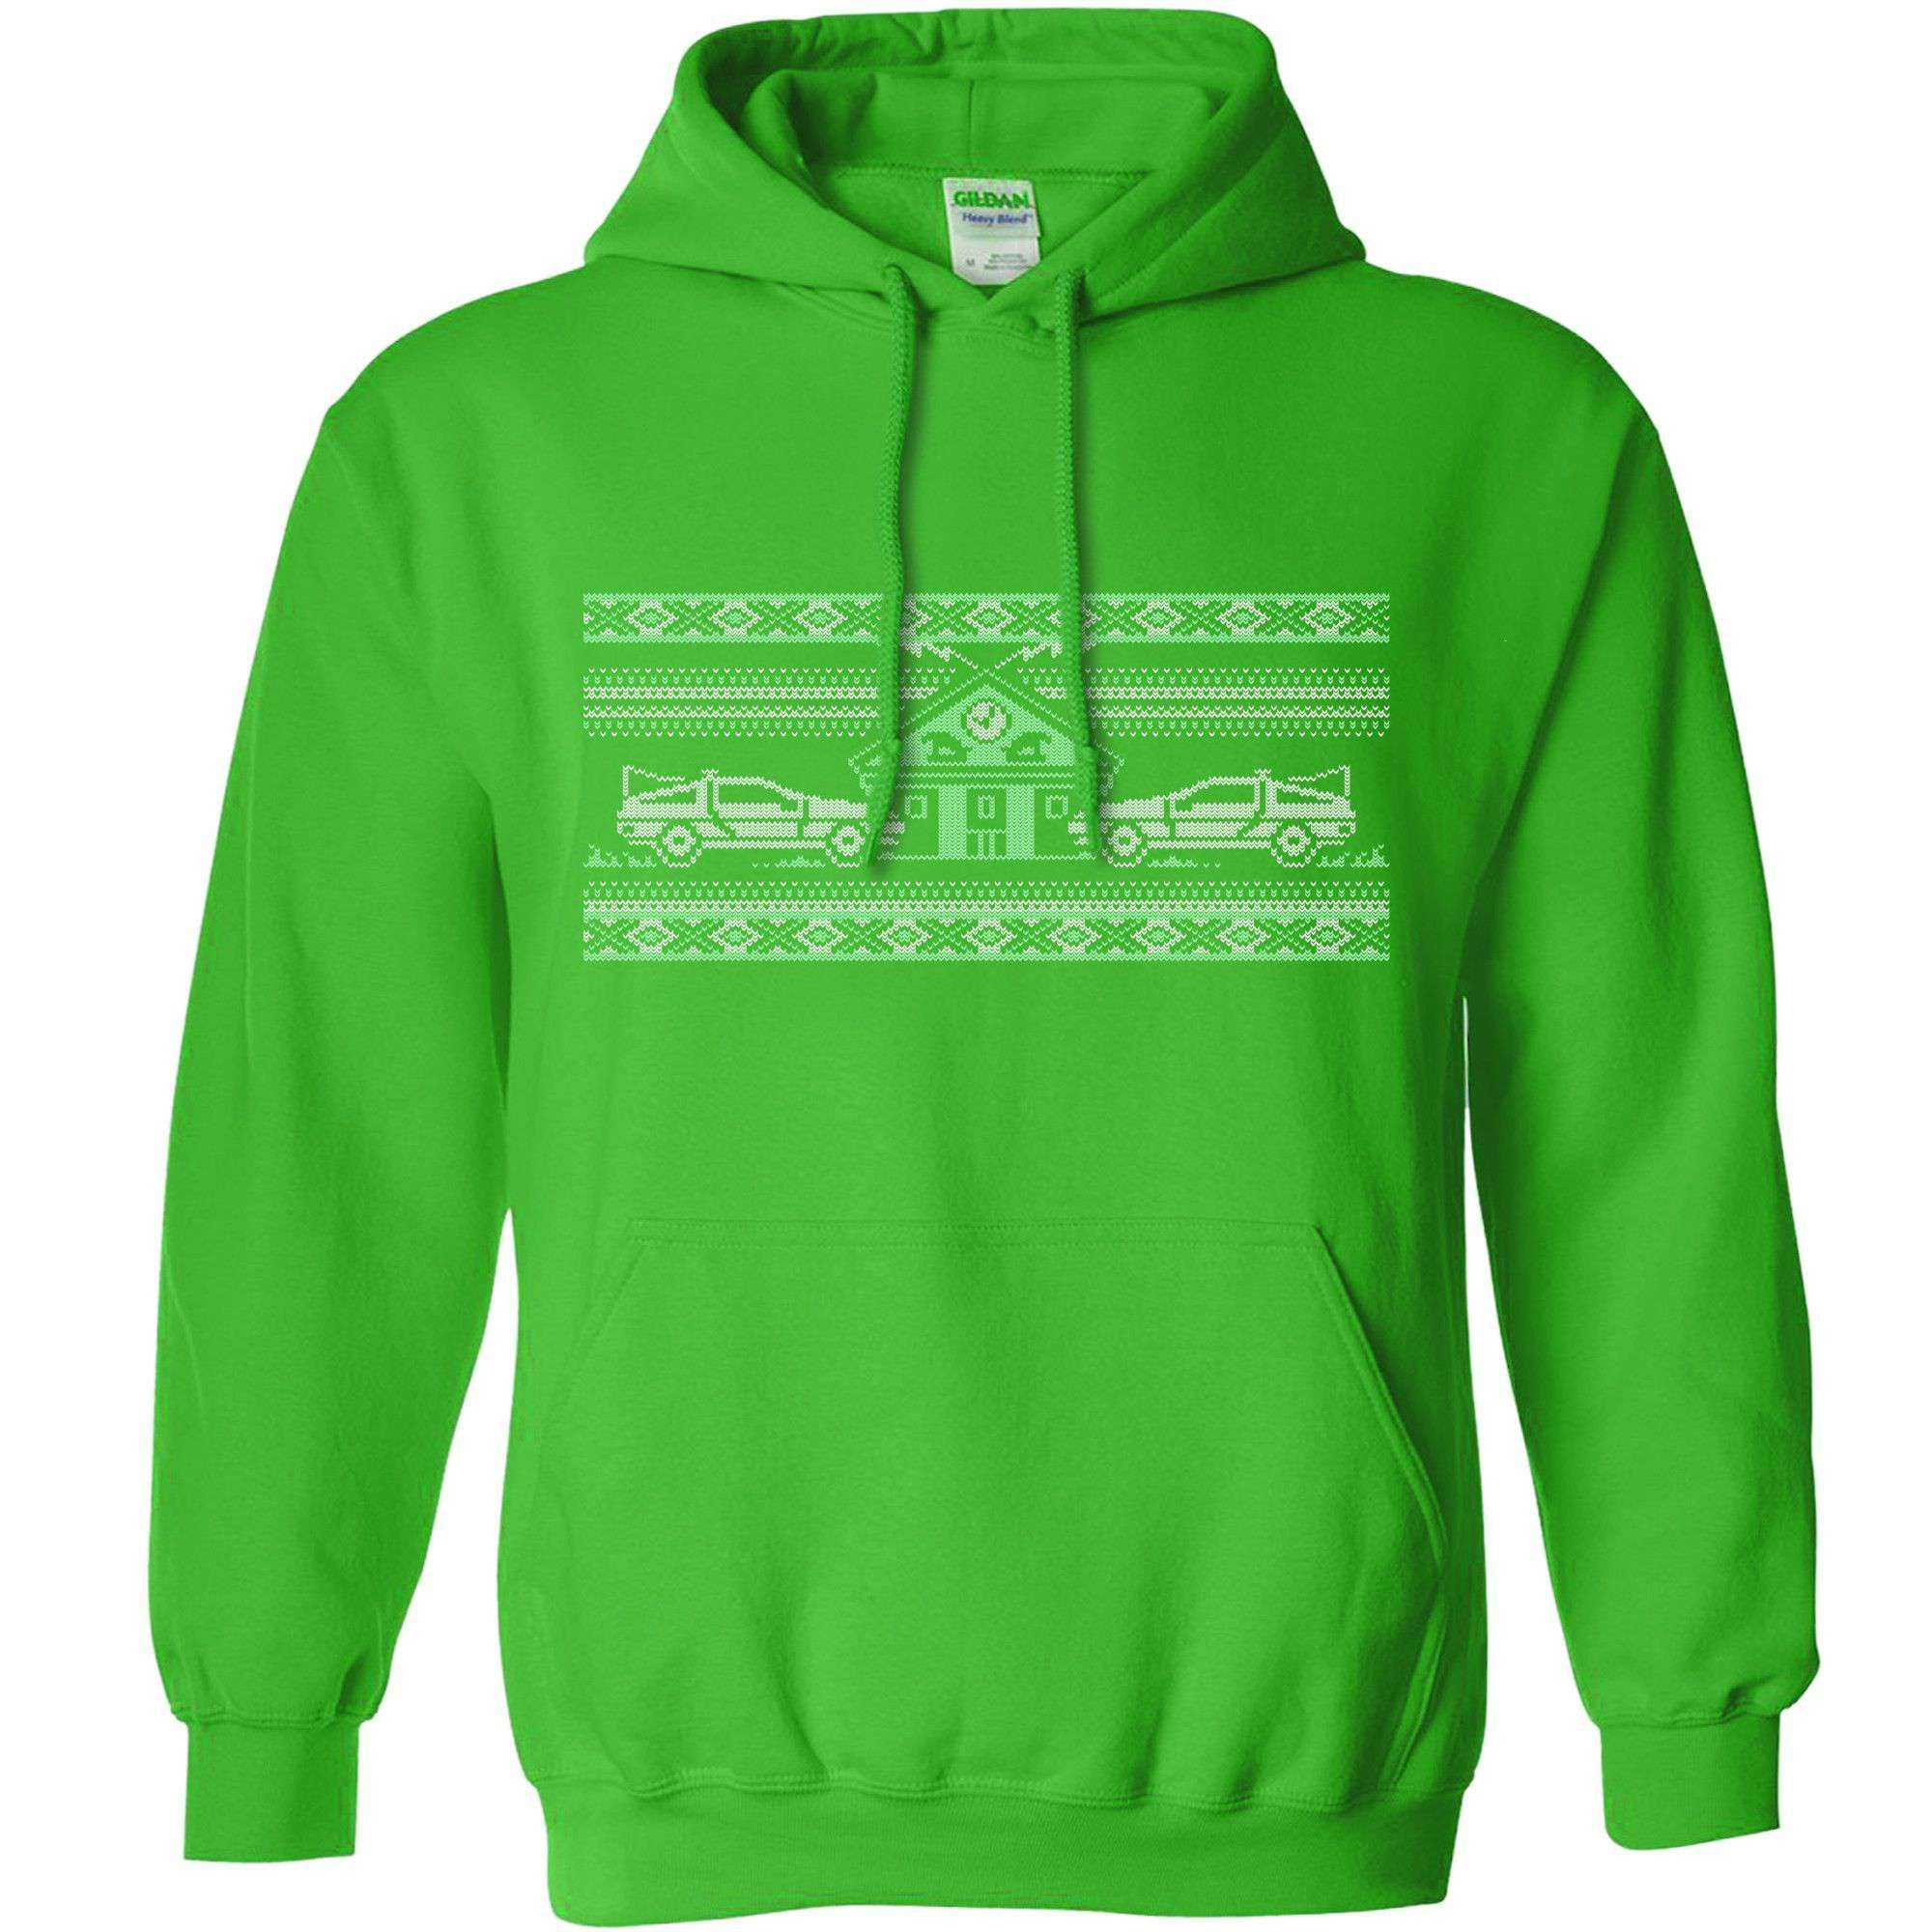 Knitted Jumper Style Hoodie - Bttf - Kelly Green / Medium